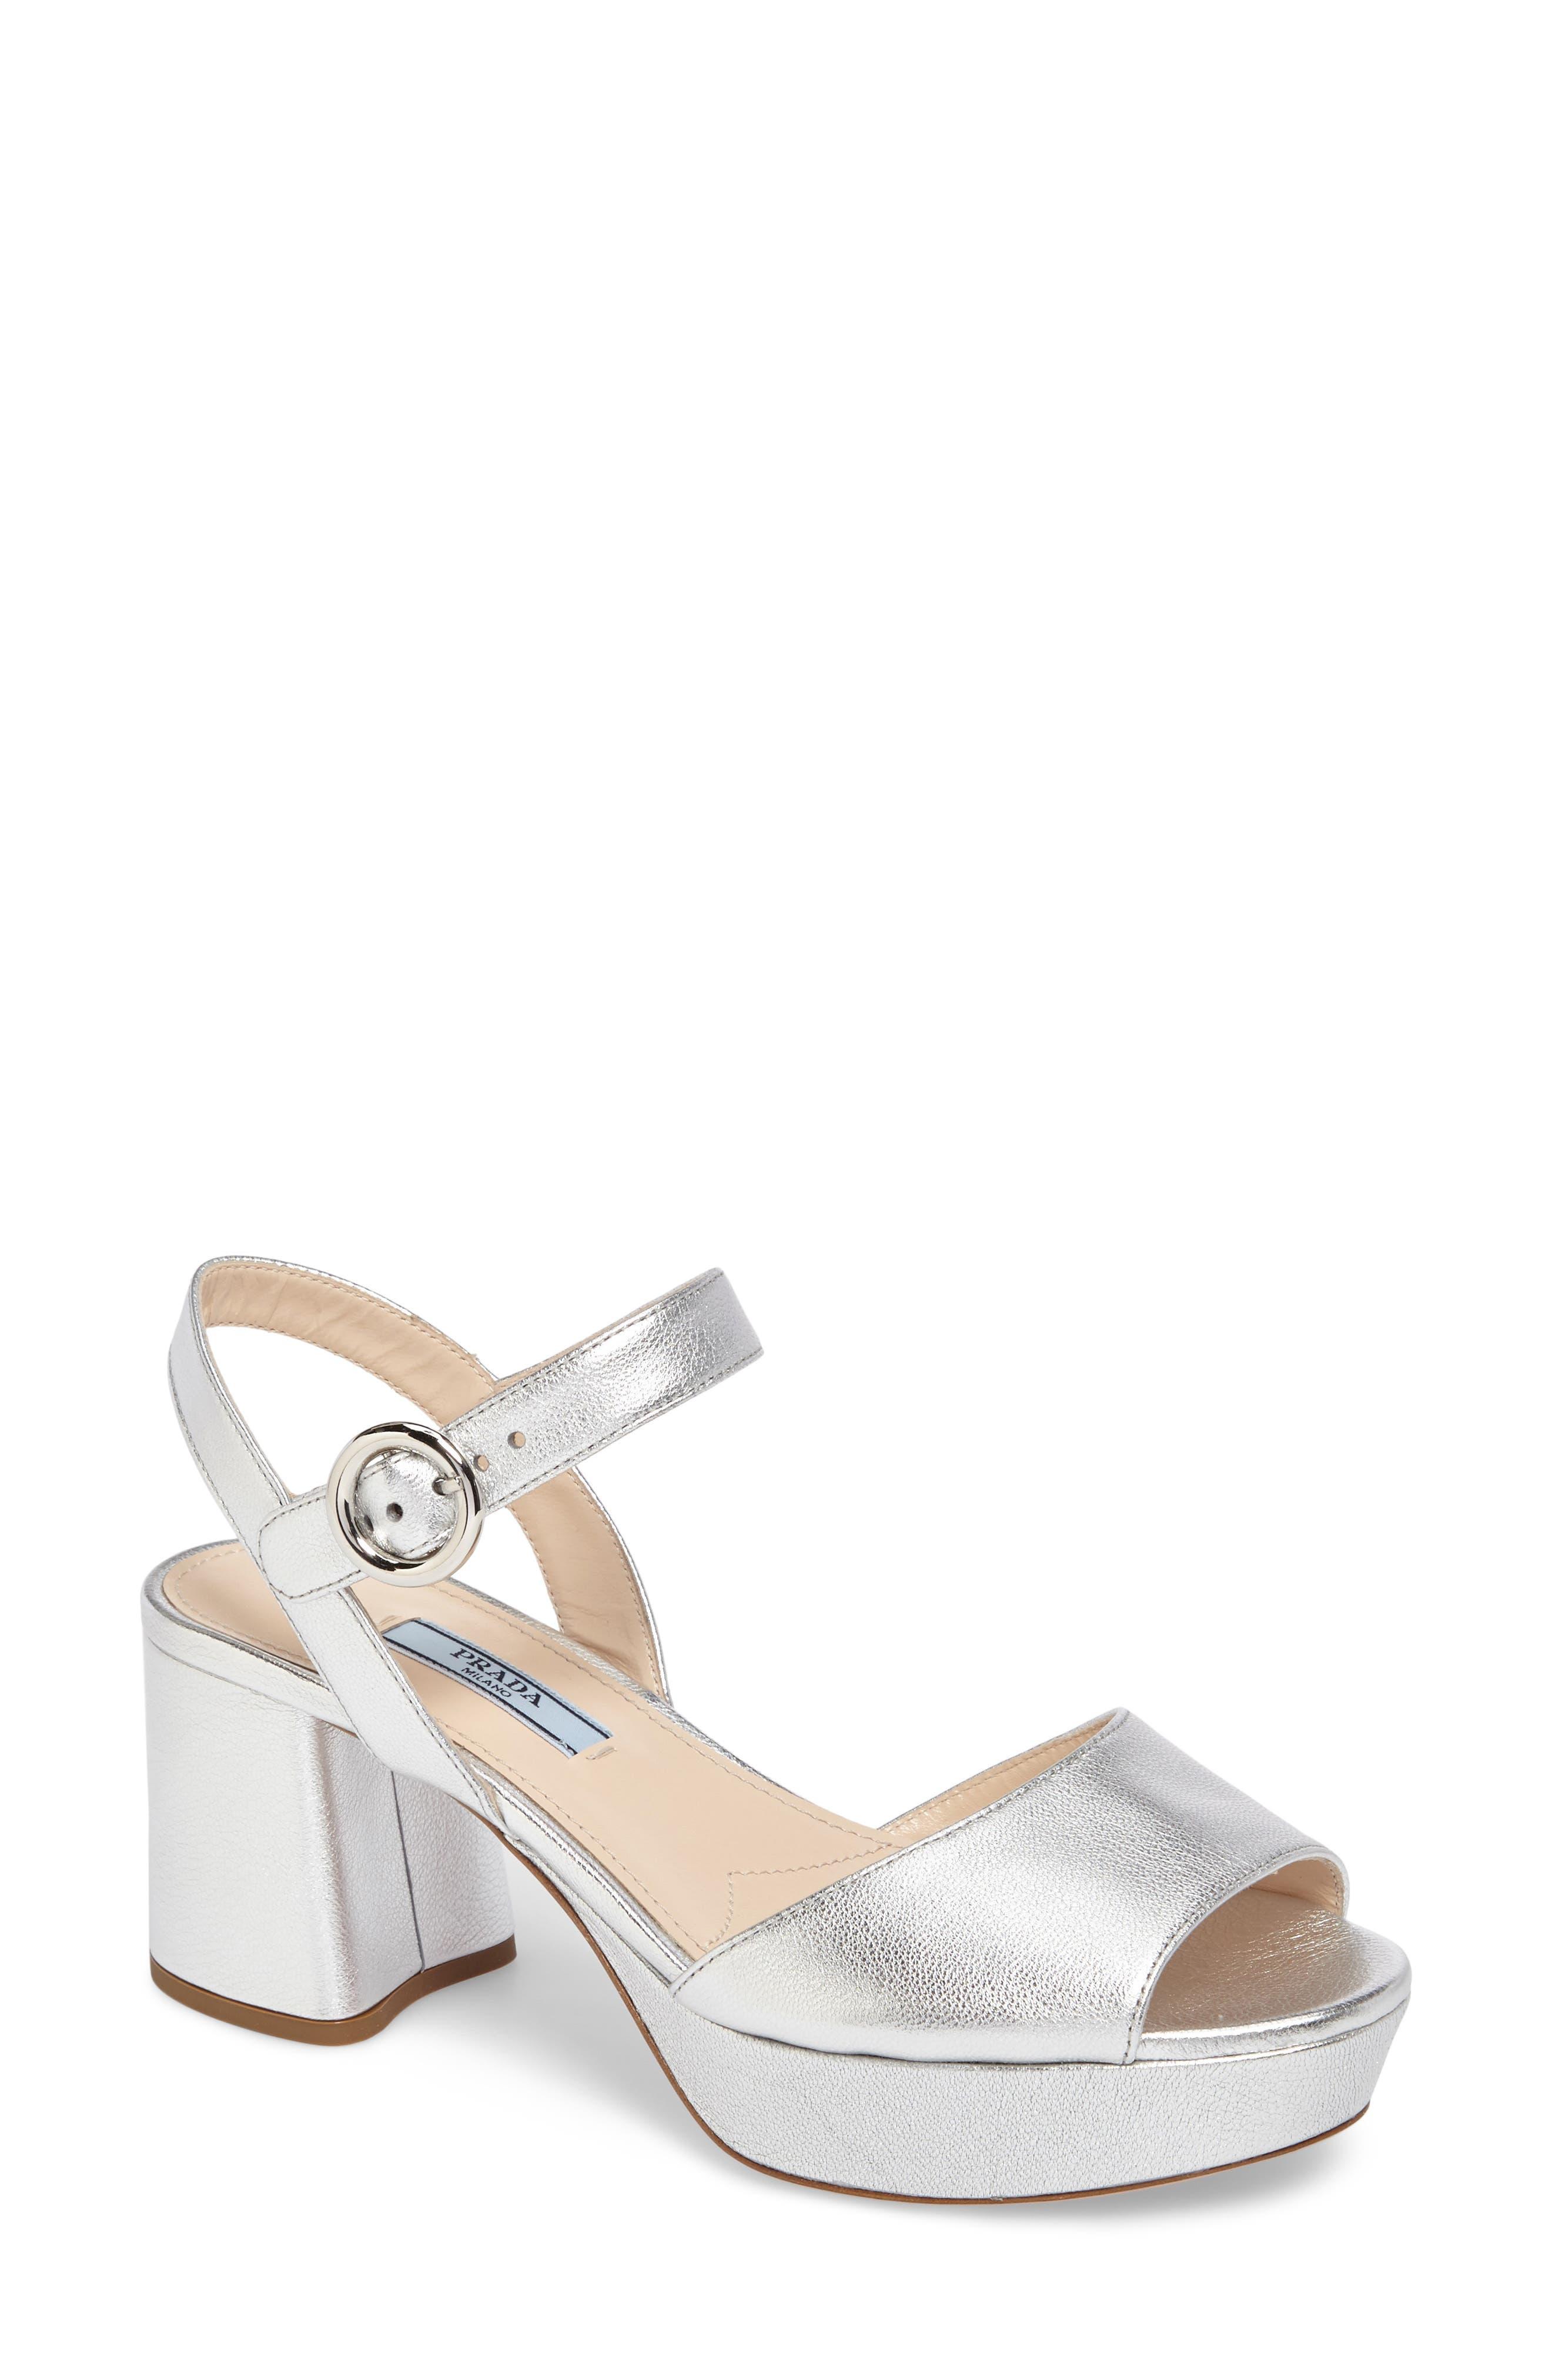 Ankle Strap Platform Sandal,                             Main thumbnail 1, color,                             Silver